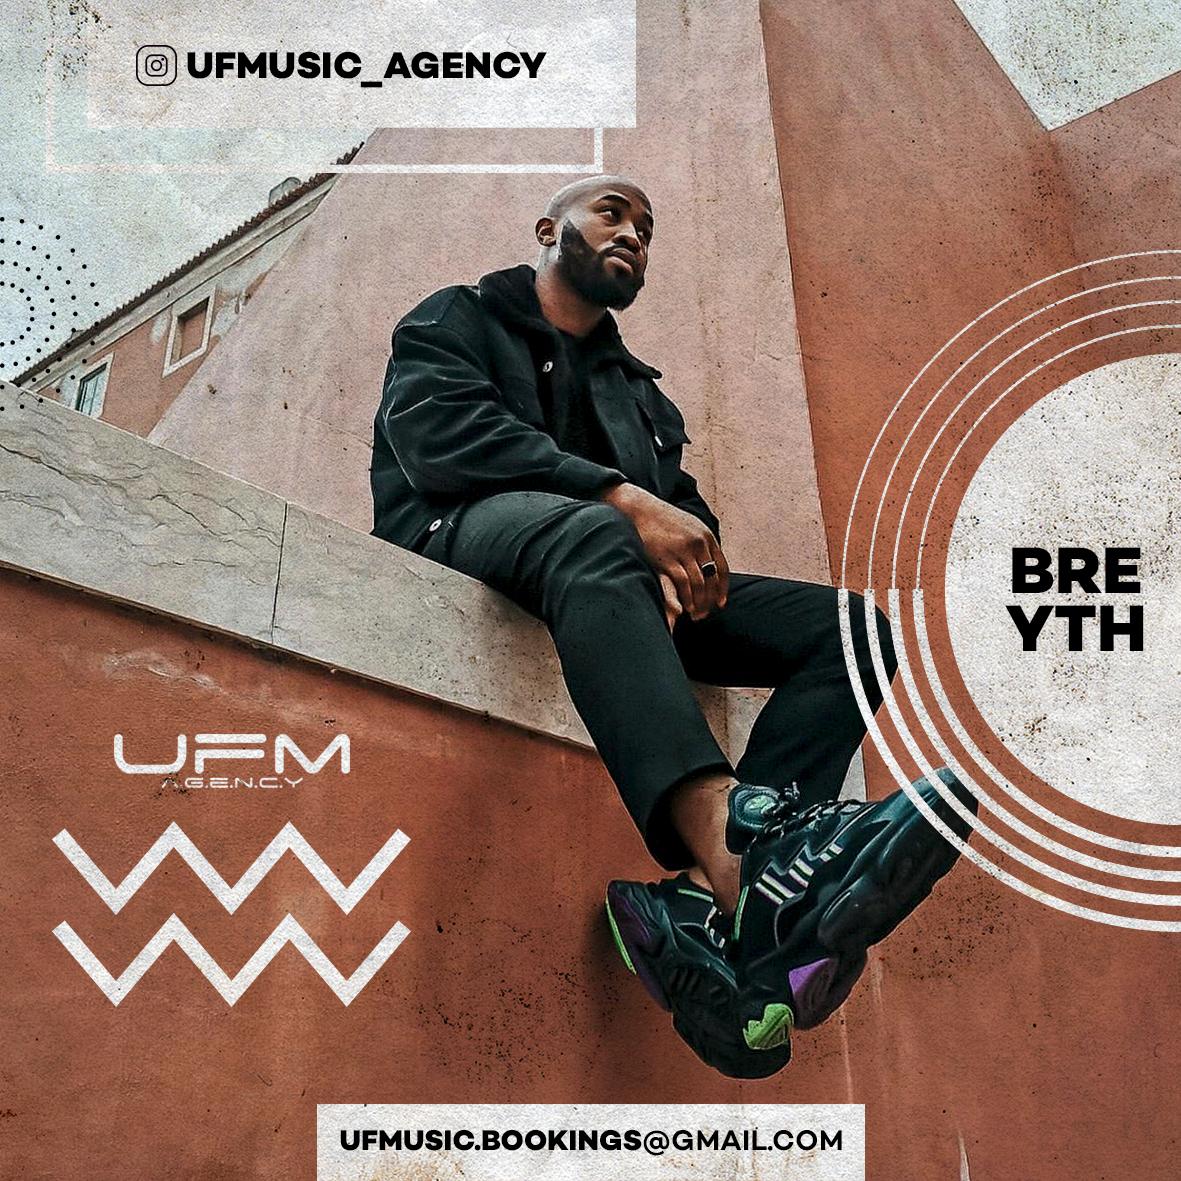 DESIGN INFORMATIVO X UFM AGENCY